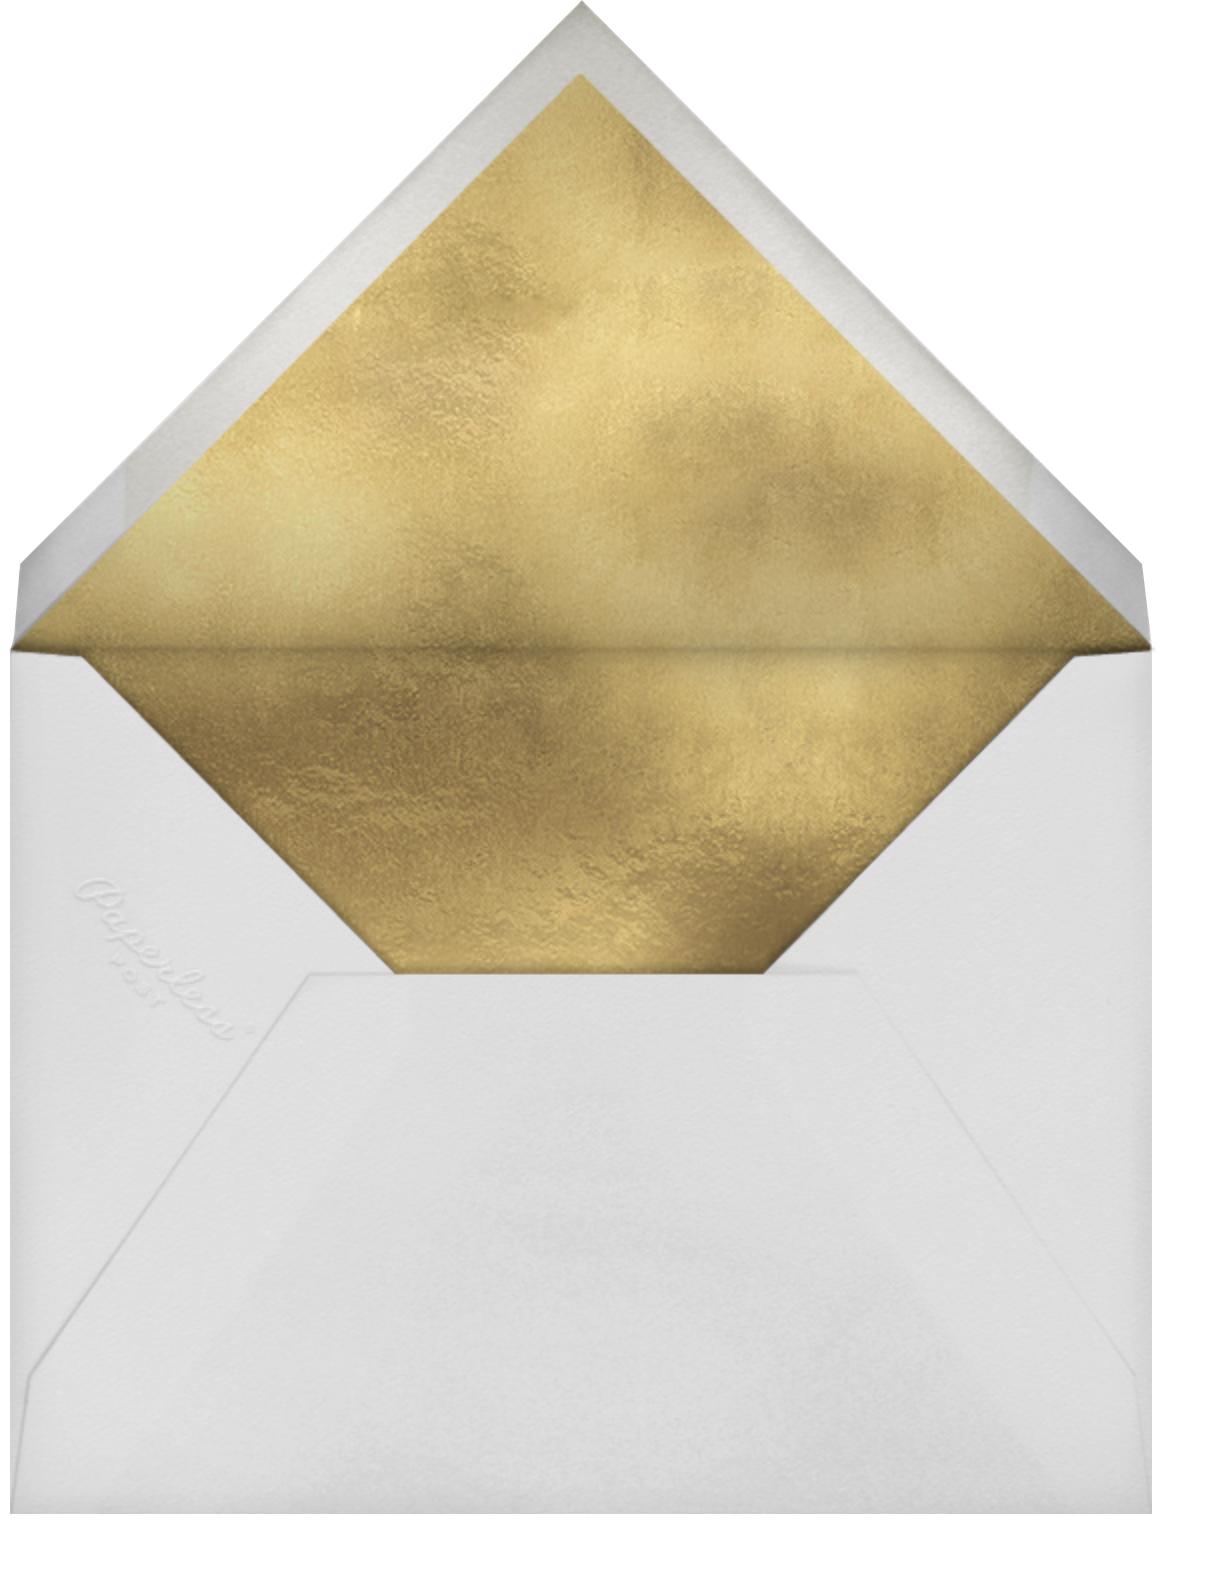 Heirloom Lace - White - Oscar de la Renta - Envelope